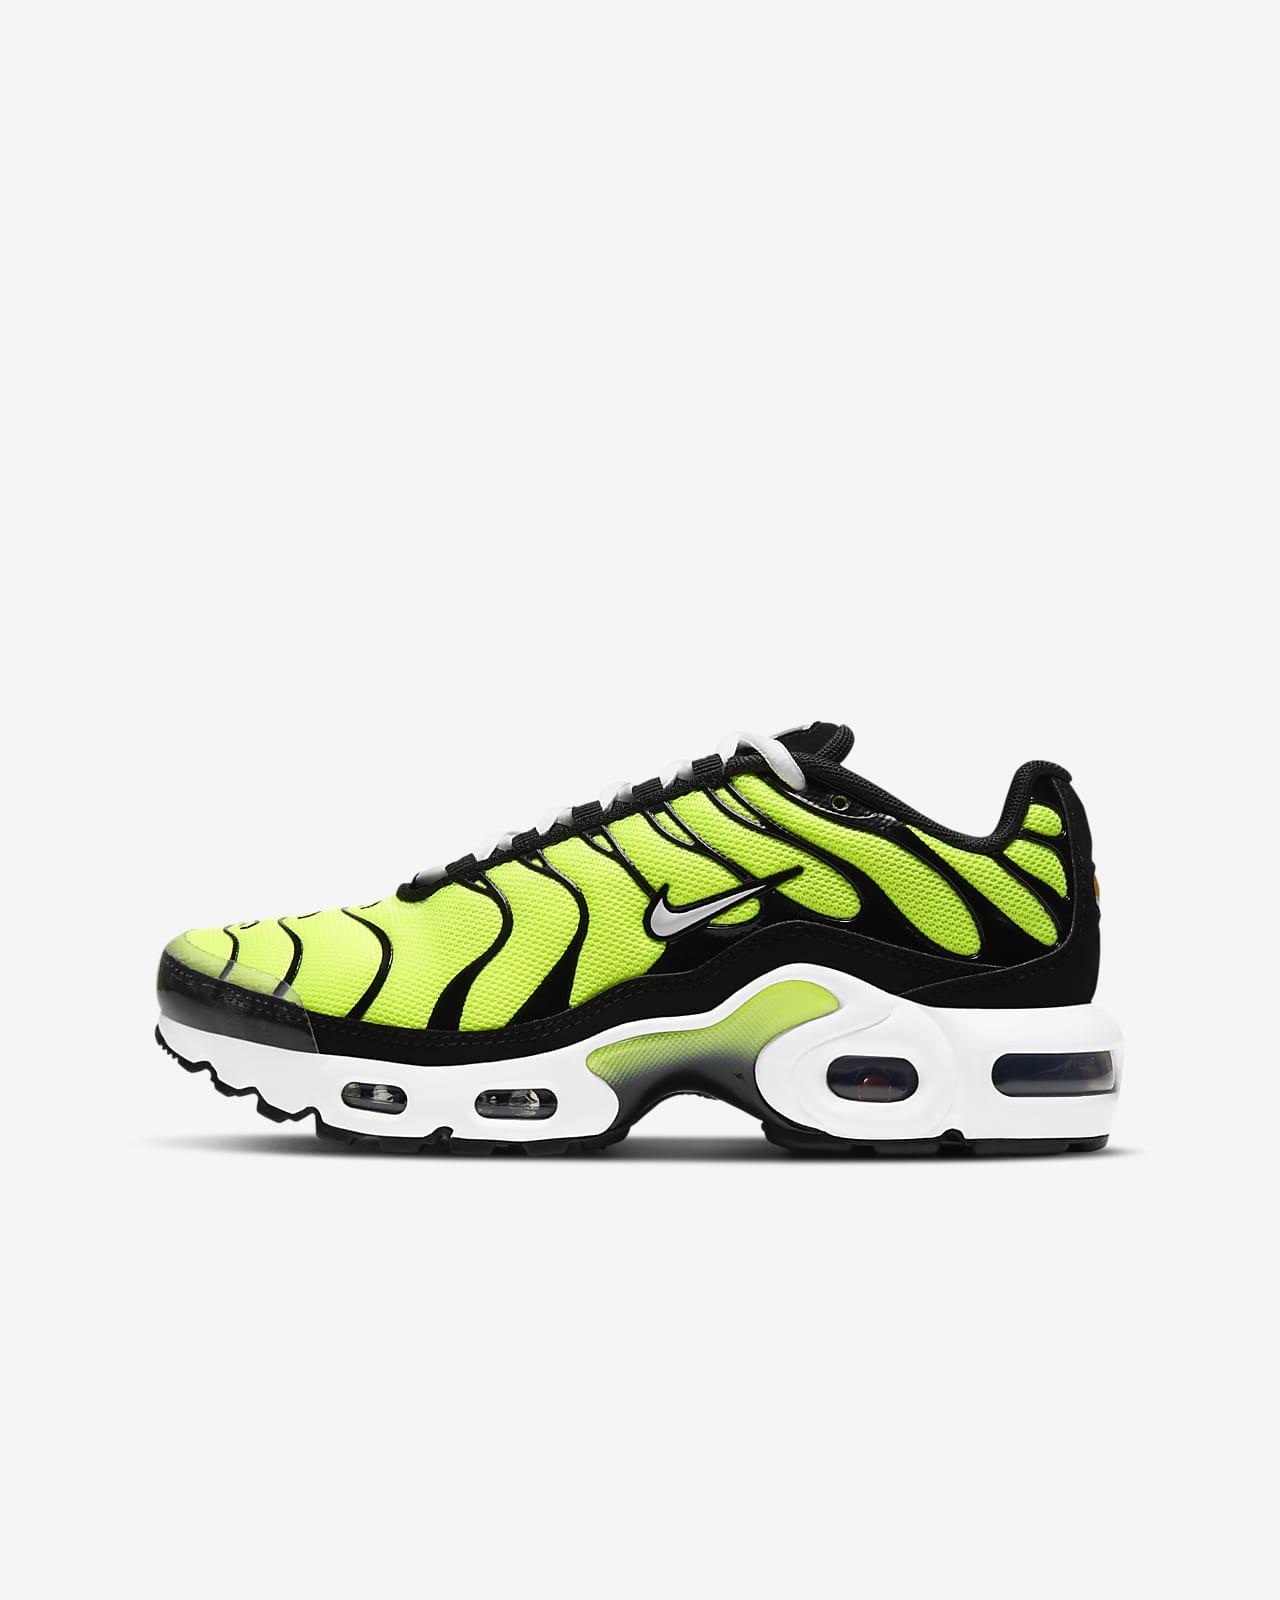 Sko Nike Air Max Plus för ungdom